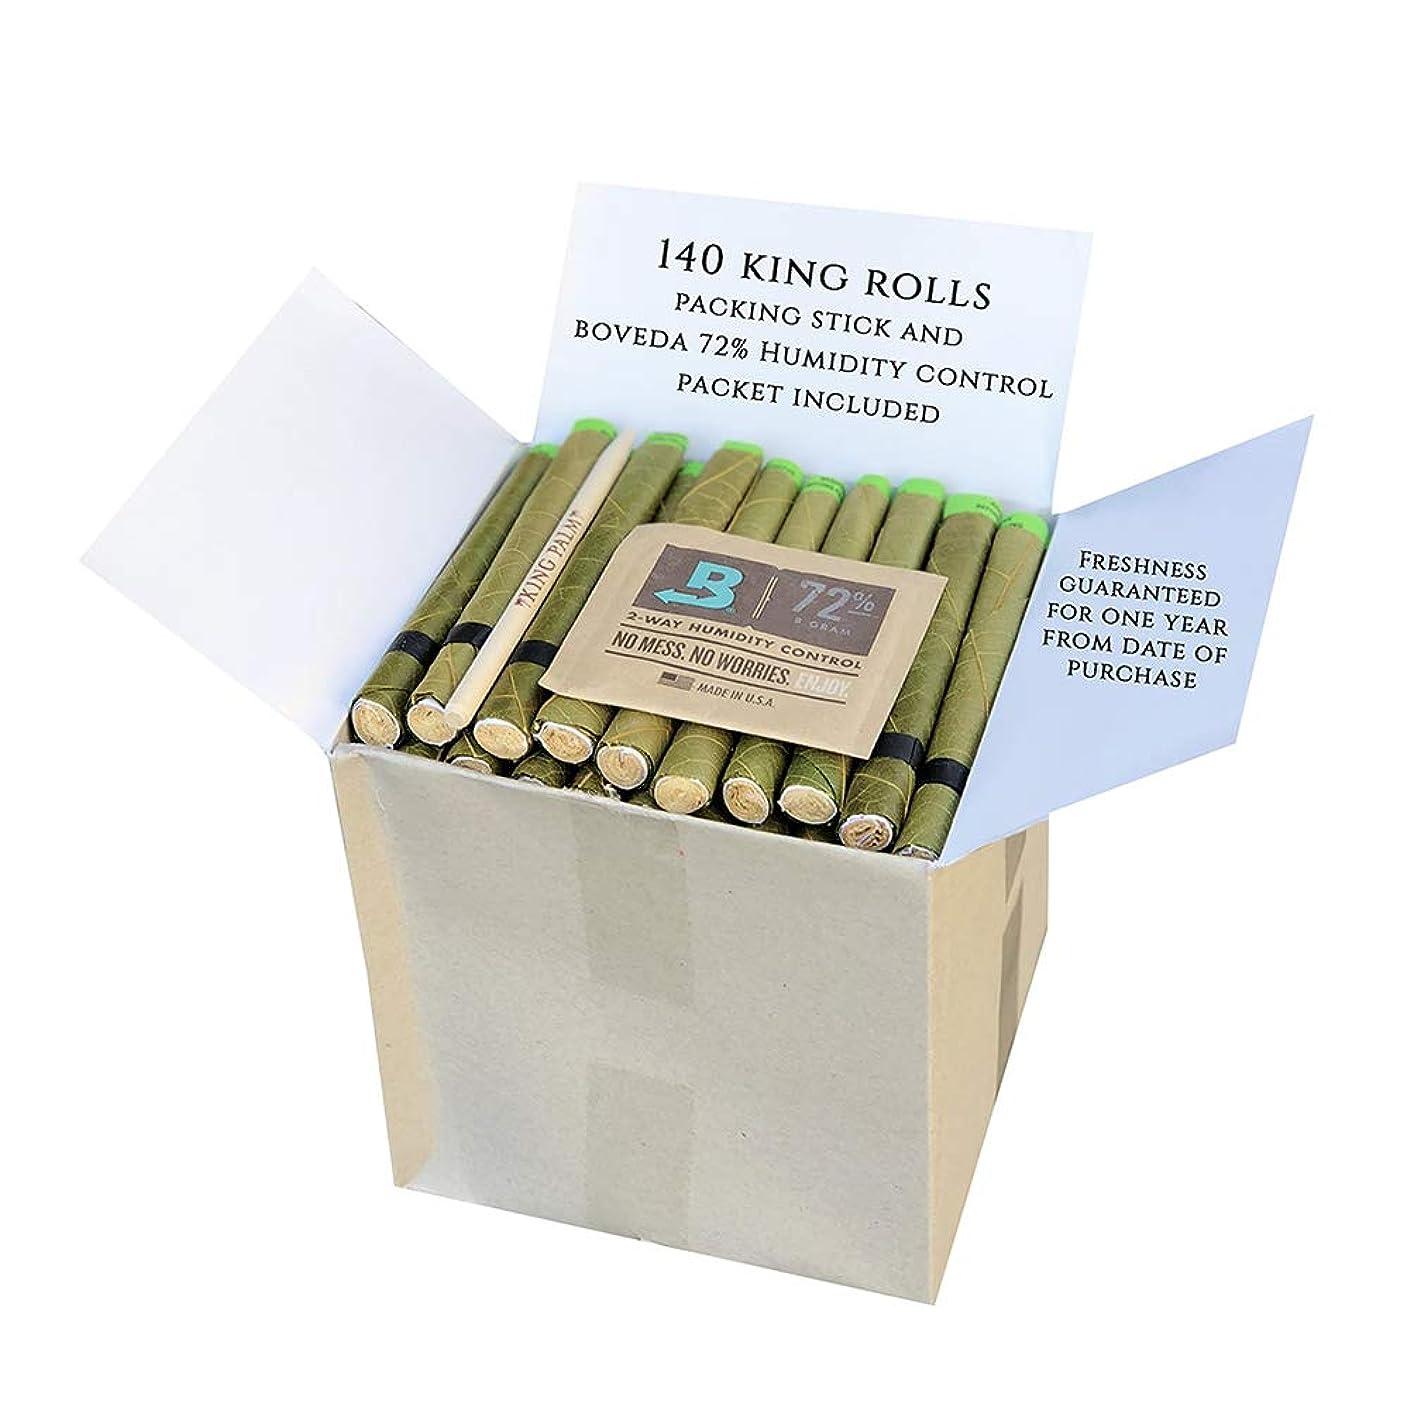 King Palm Hand Rolled Leaf Wrap Rolls + Boveda - King Size - 140 Count Bulk Pack